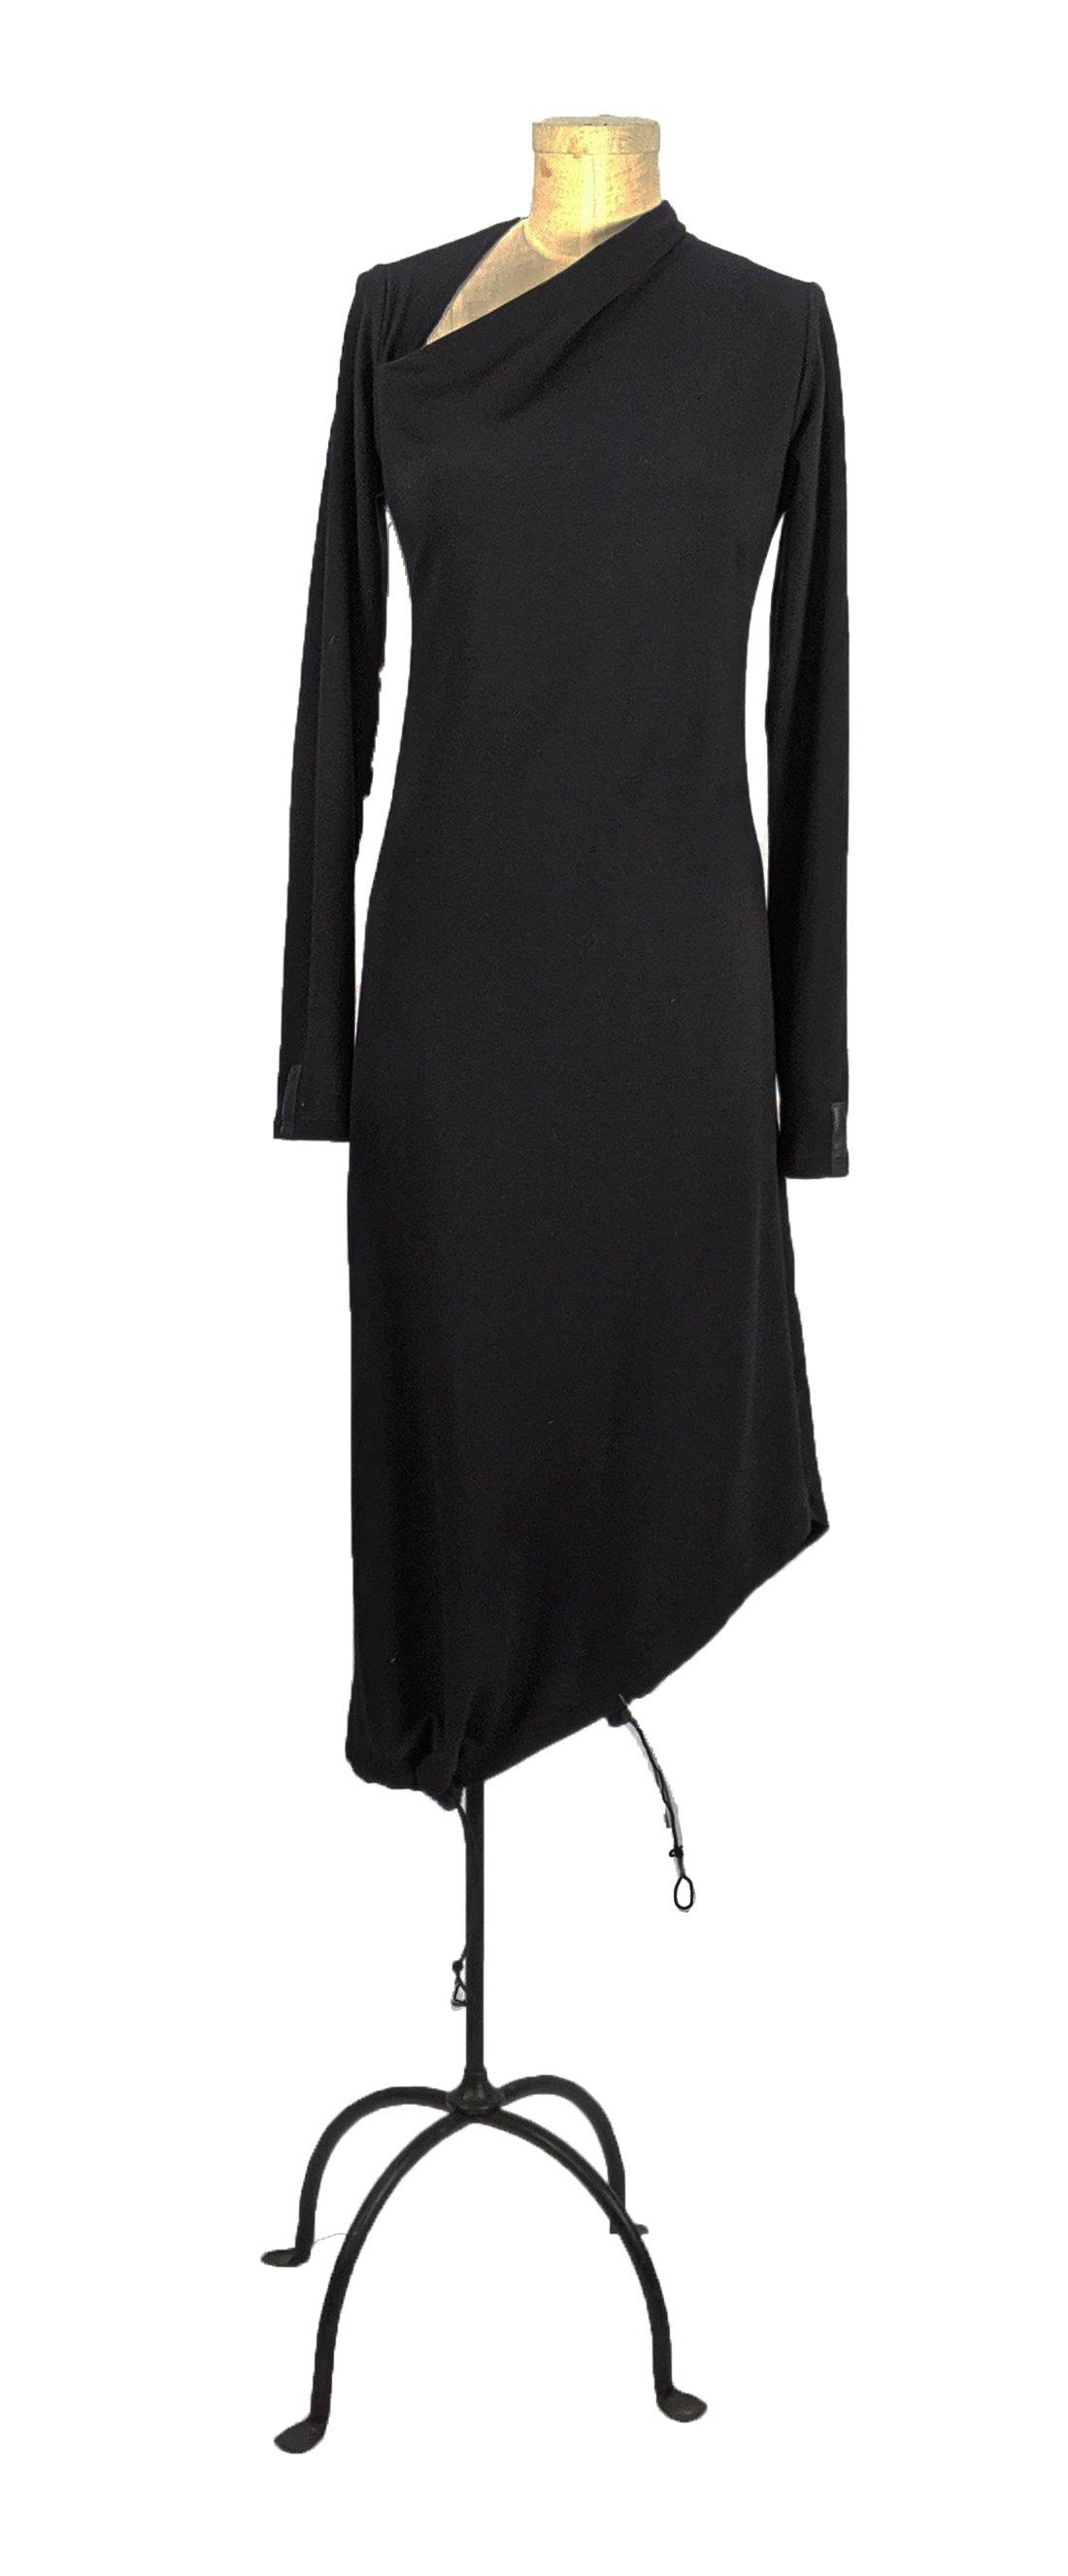 Image of Vatican dress black